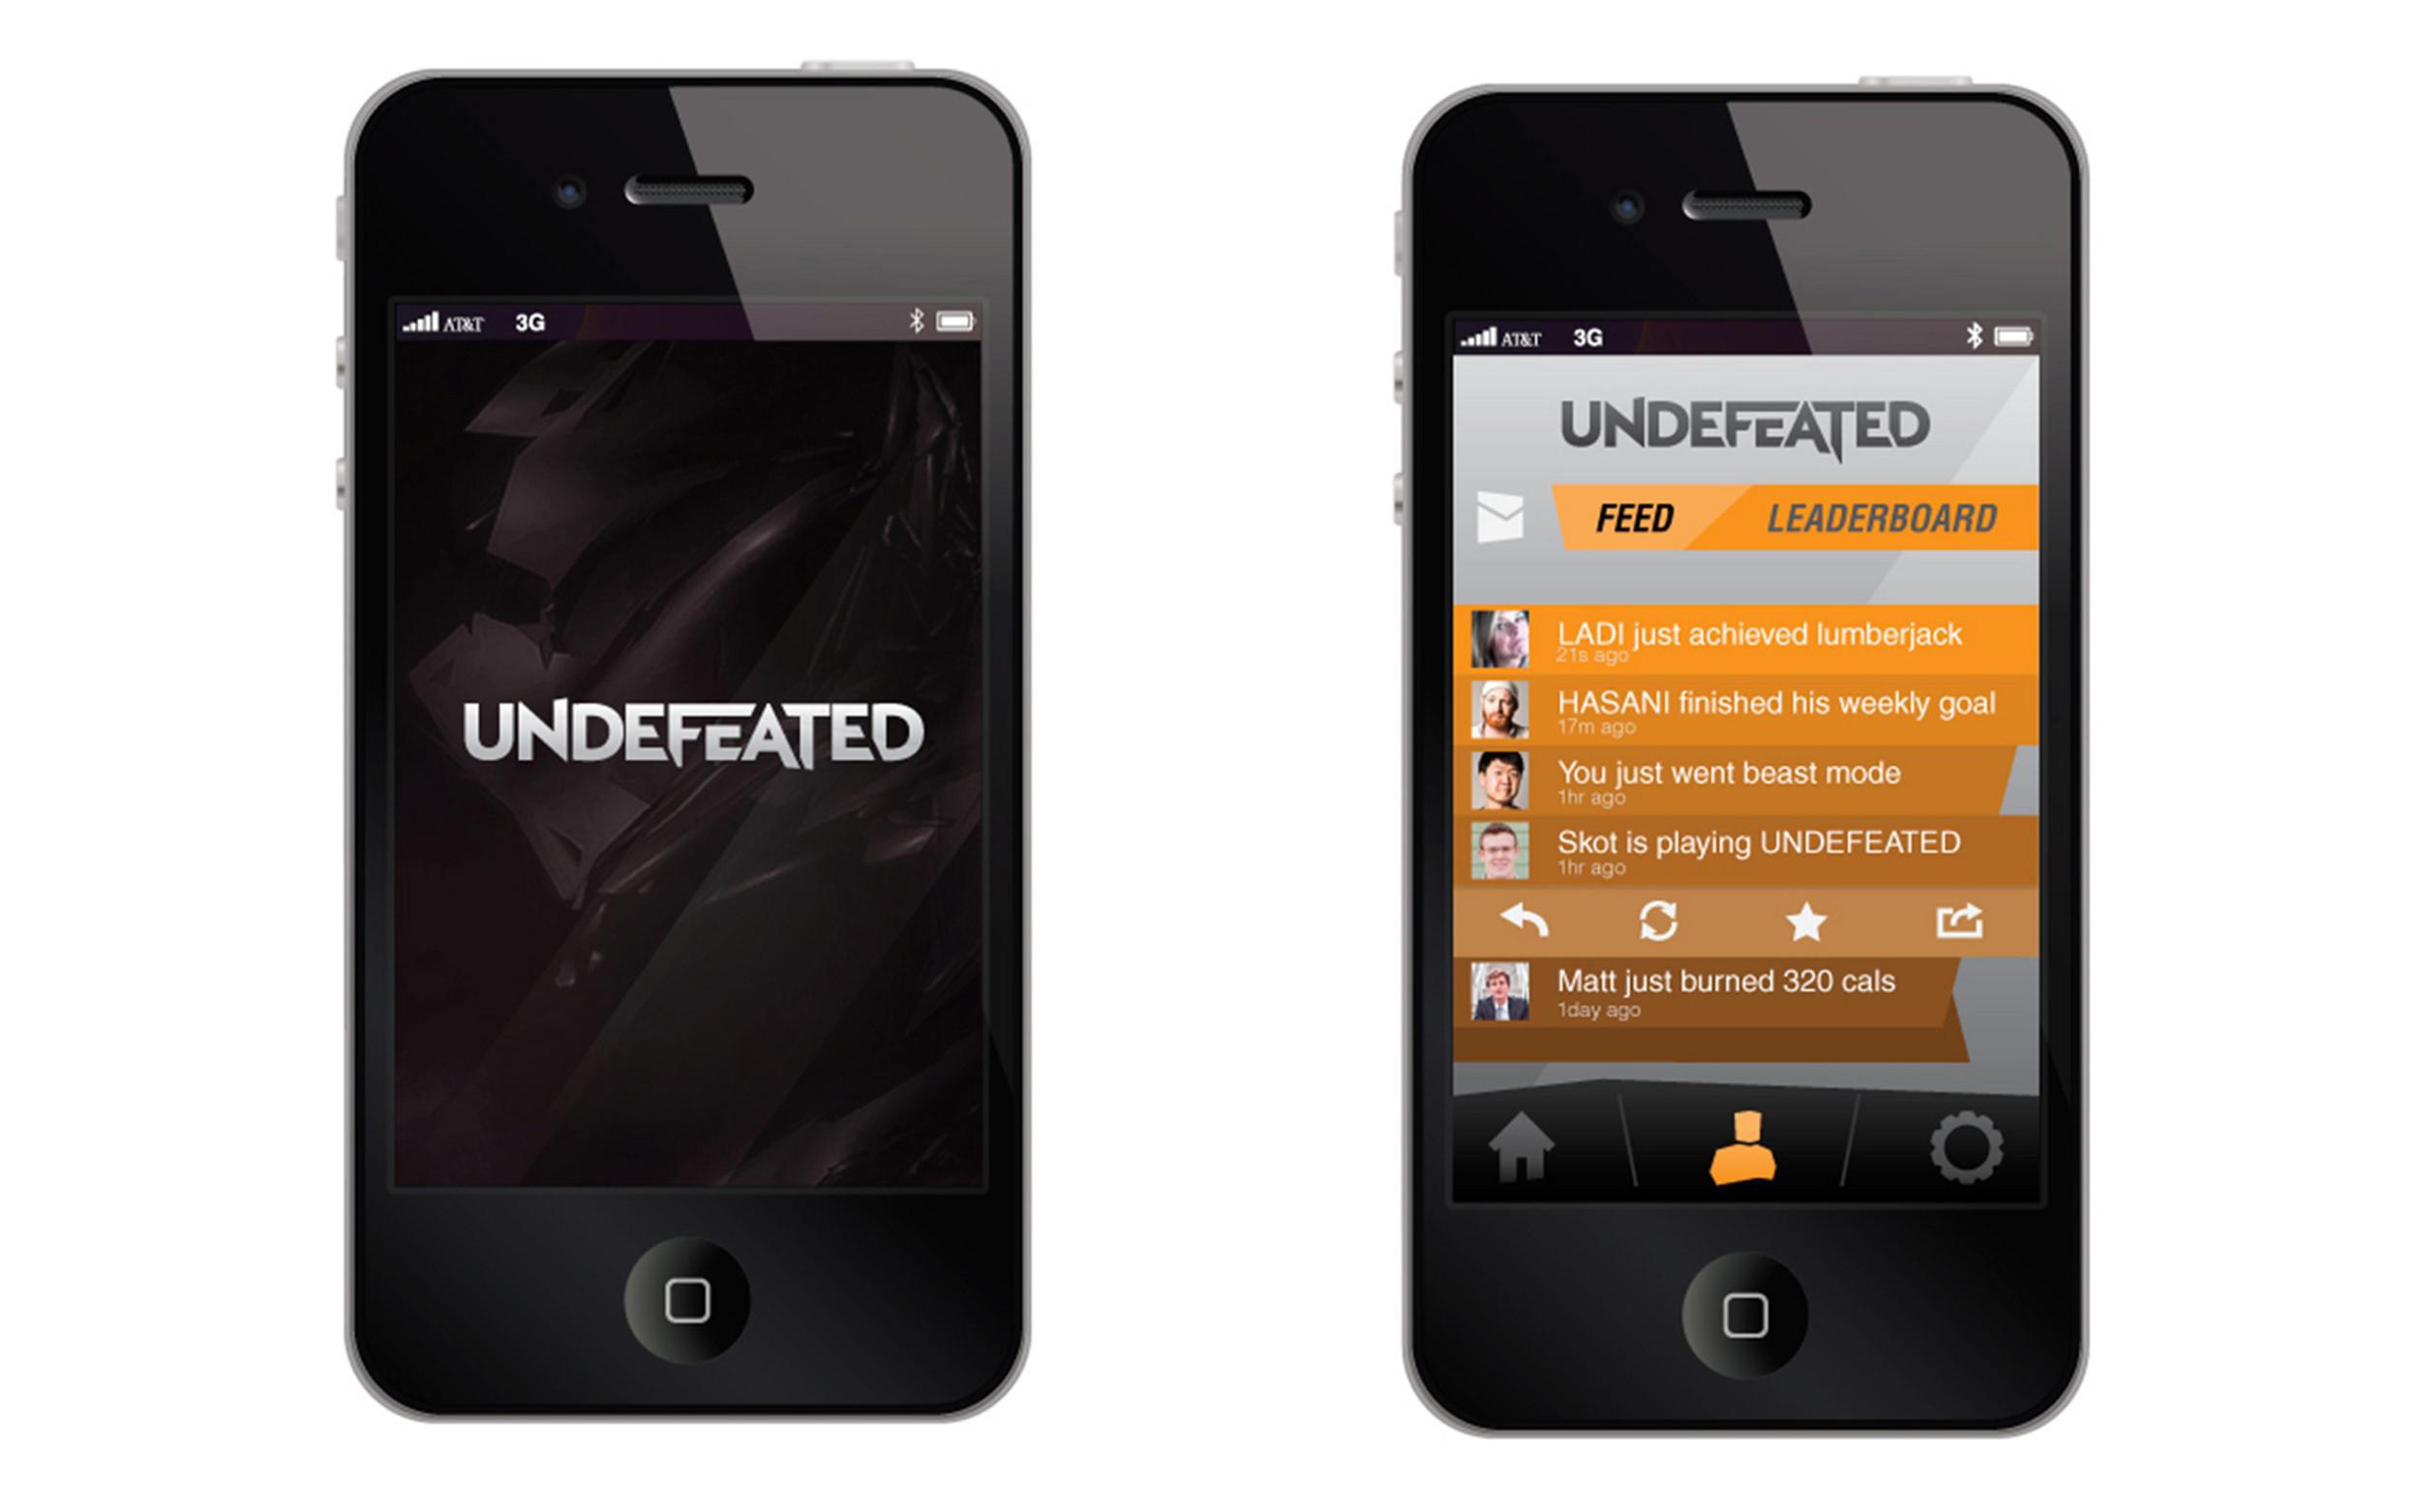 undefeated2.jpg